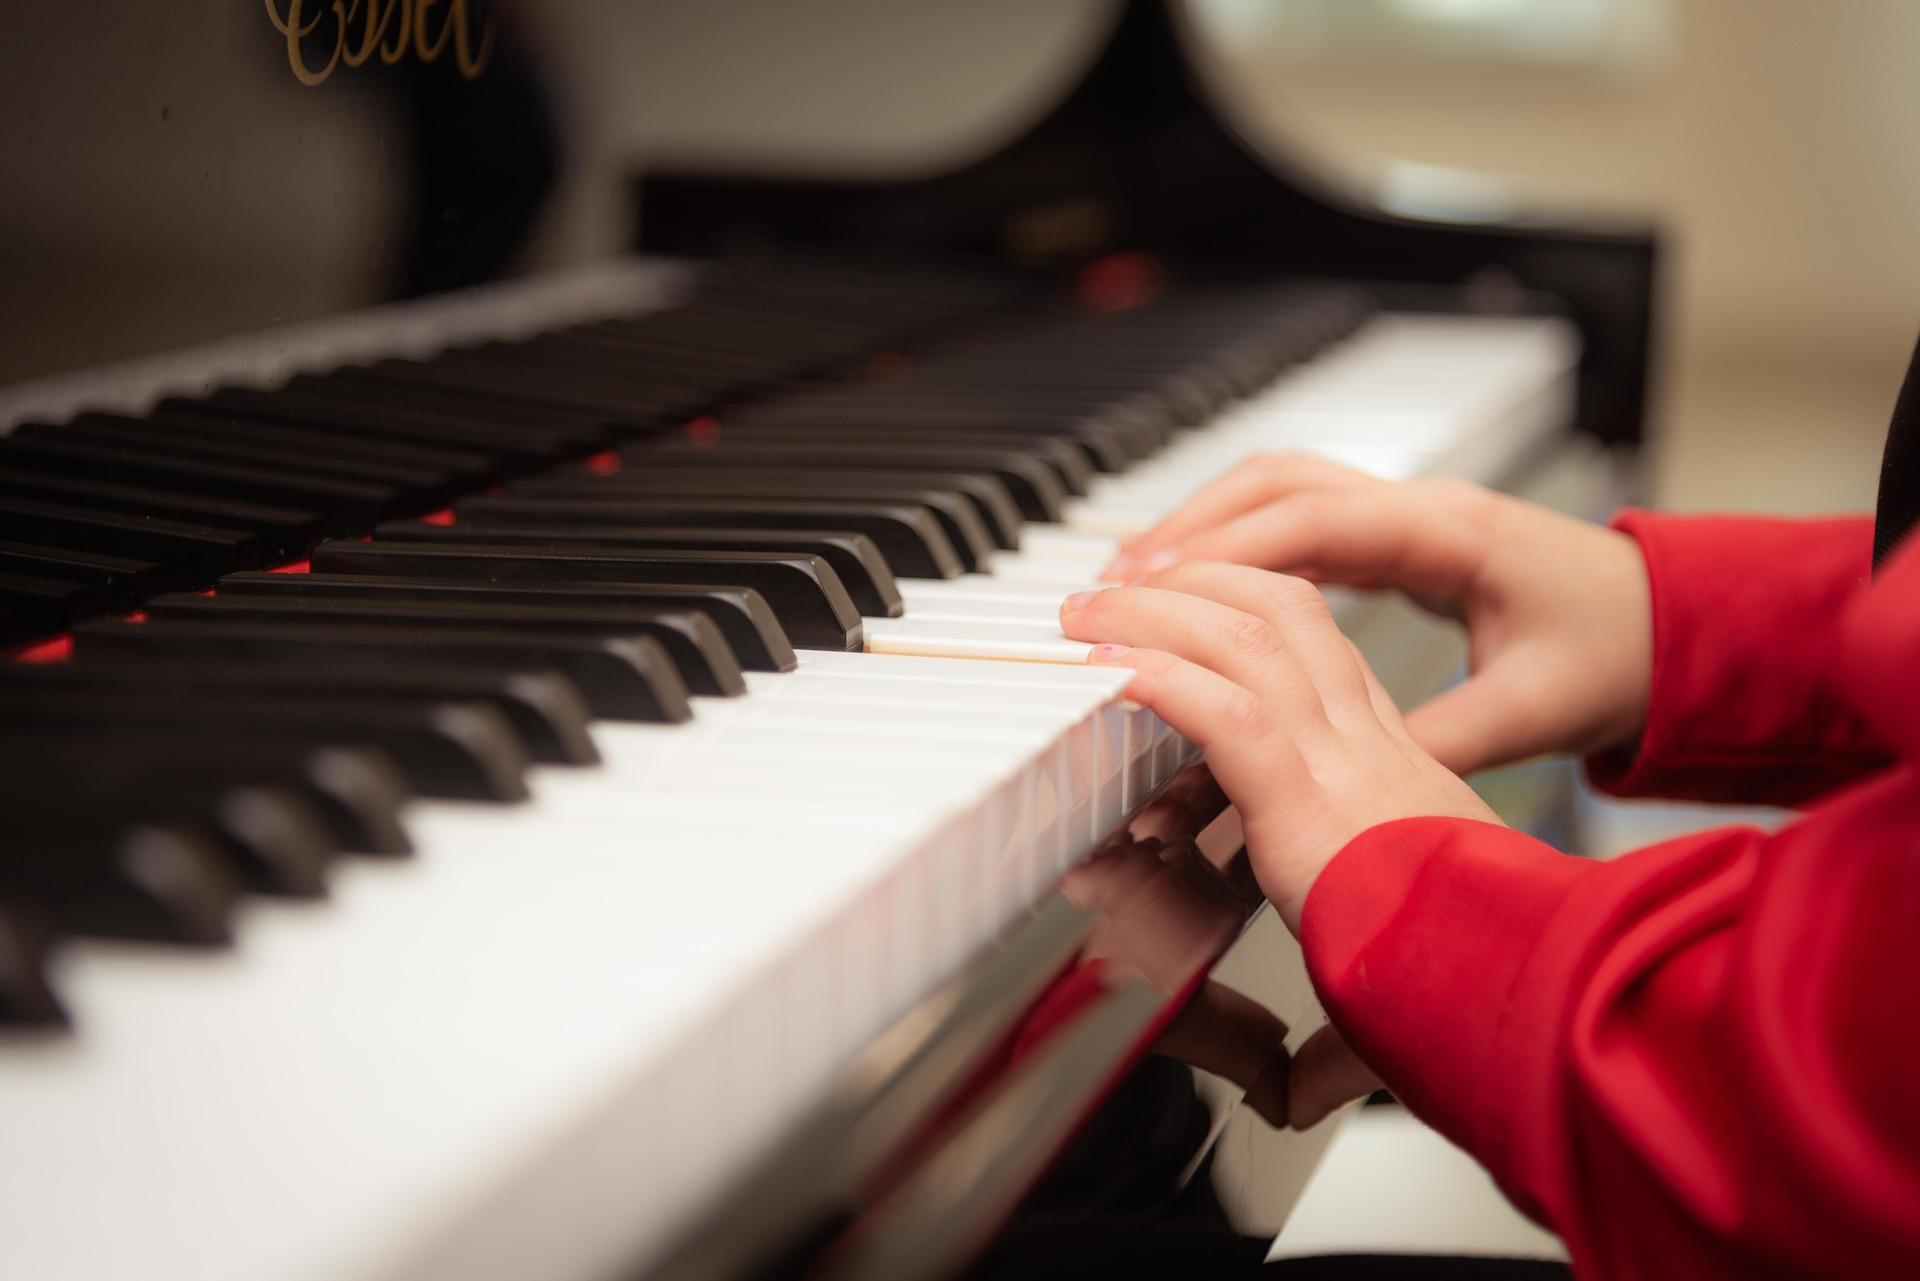 Sanitizing piano